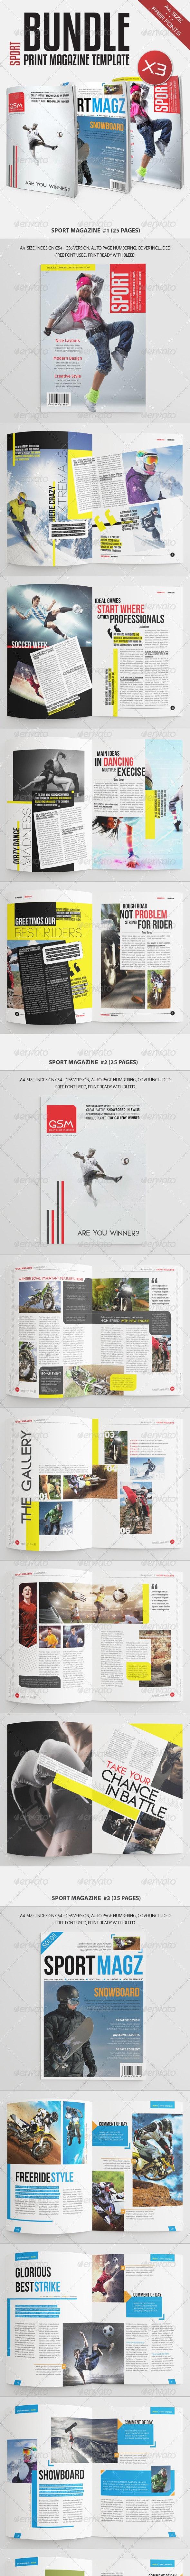 Sport Magazine Bundle Vol5 - Magazines Print Templates